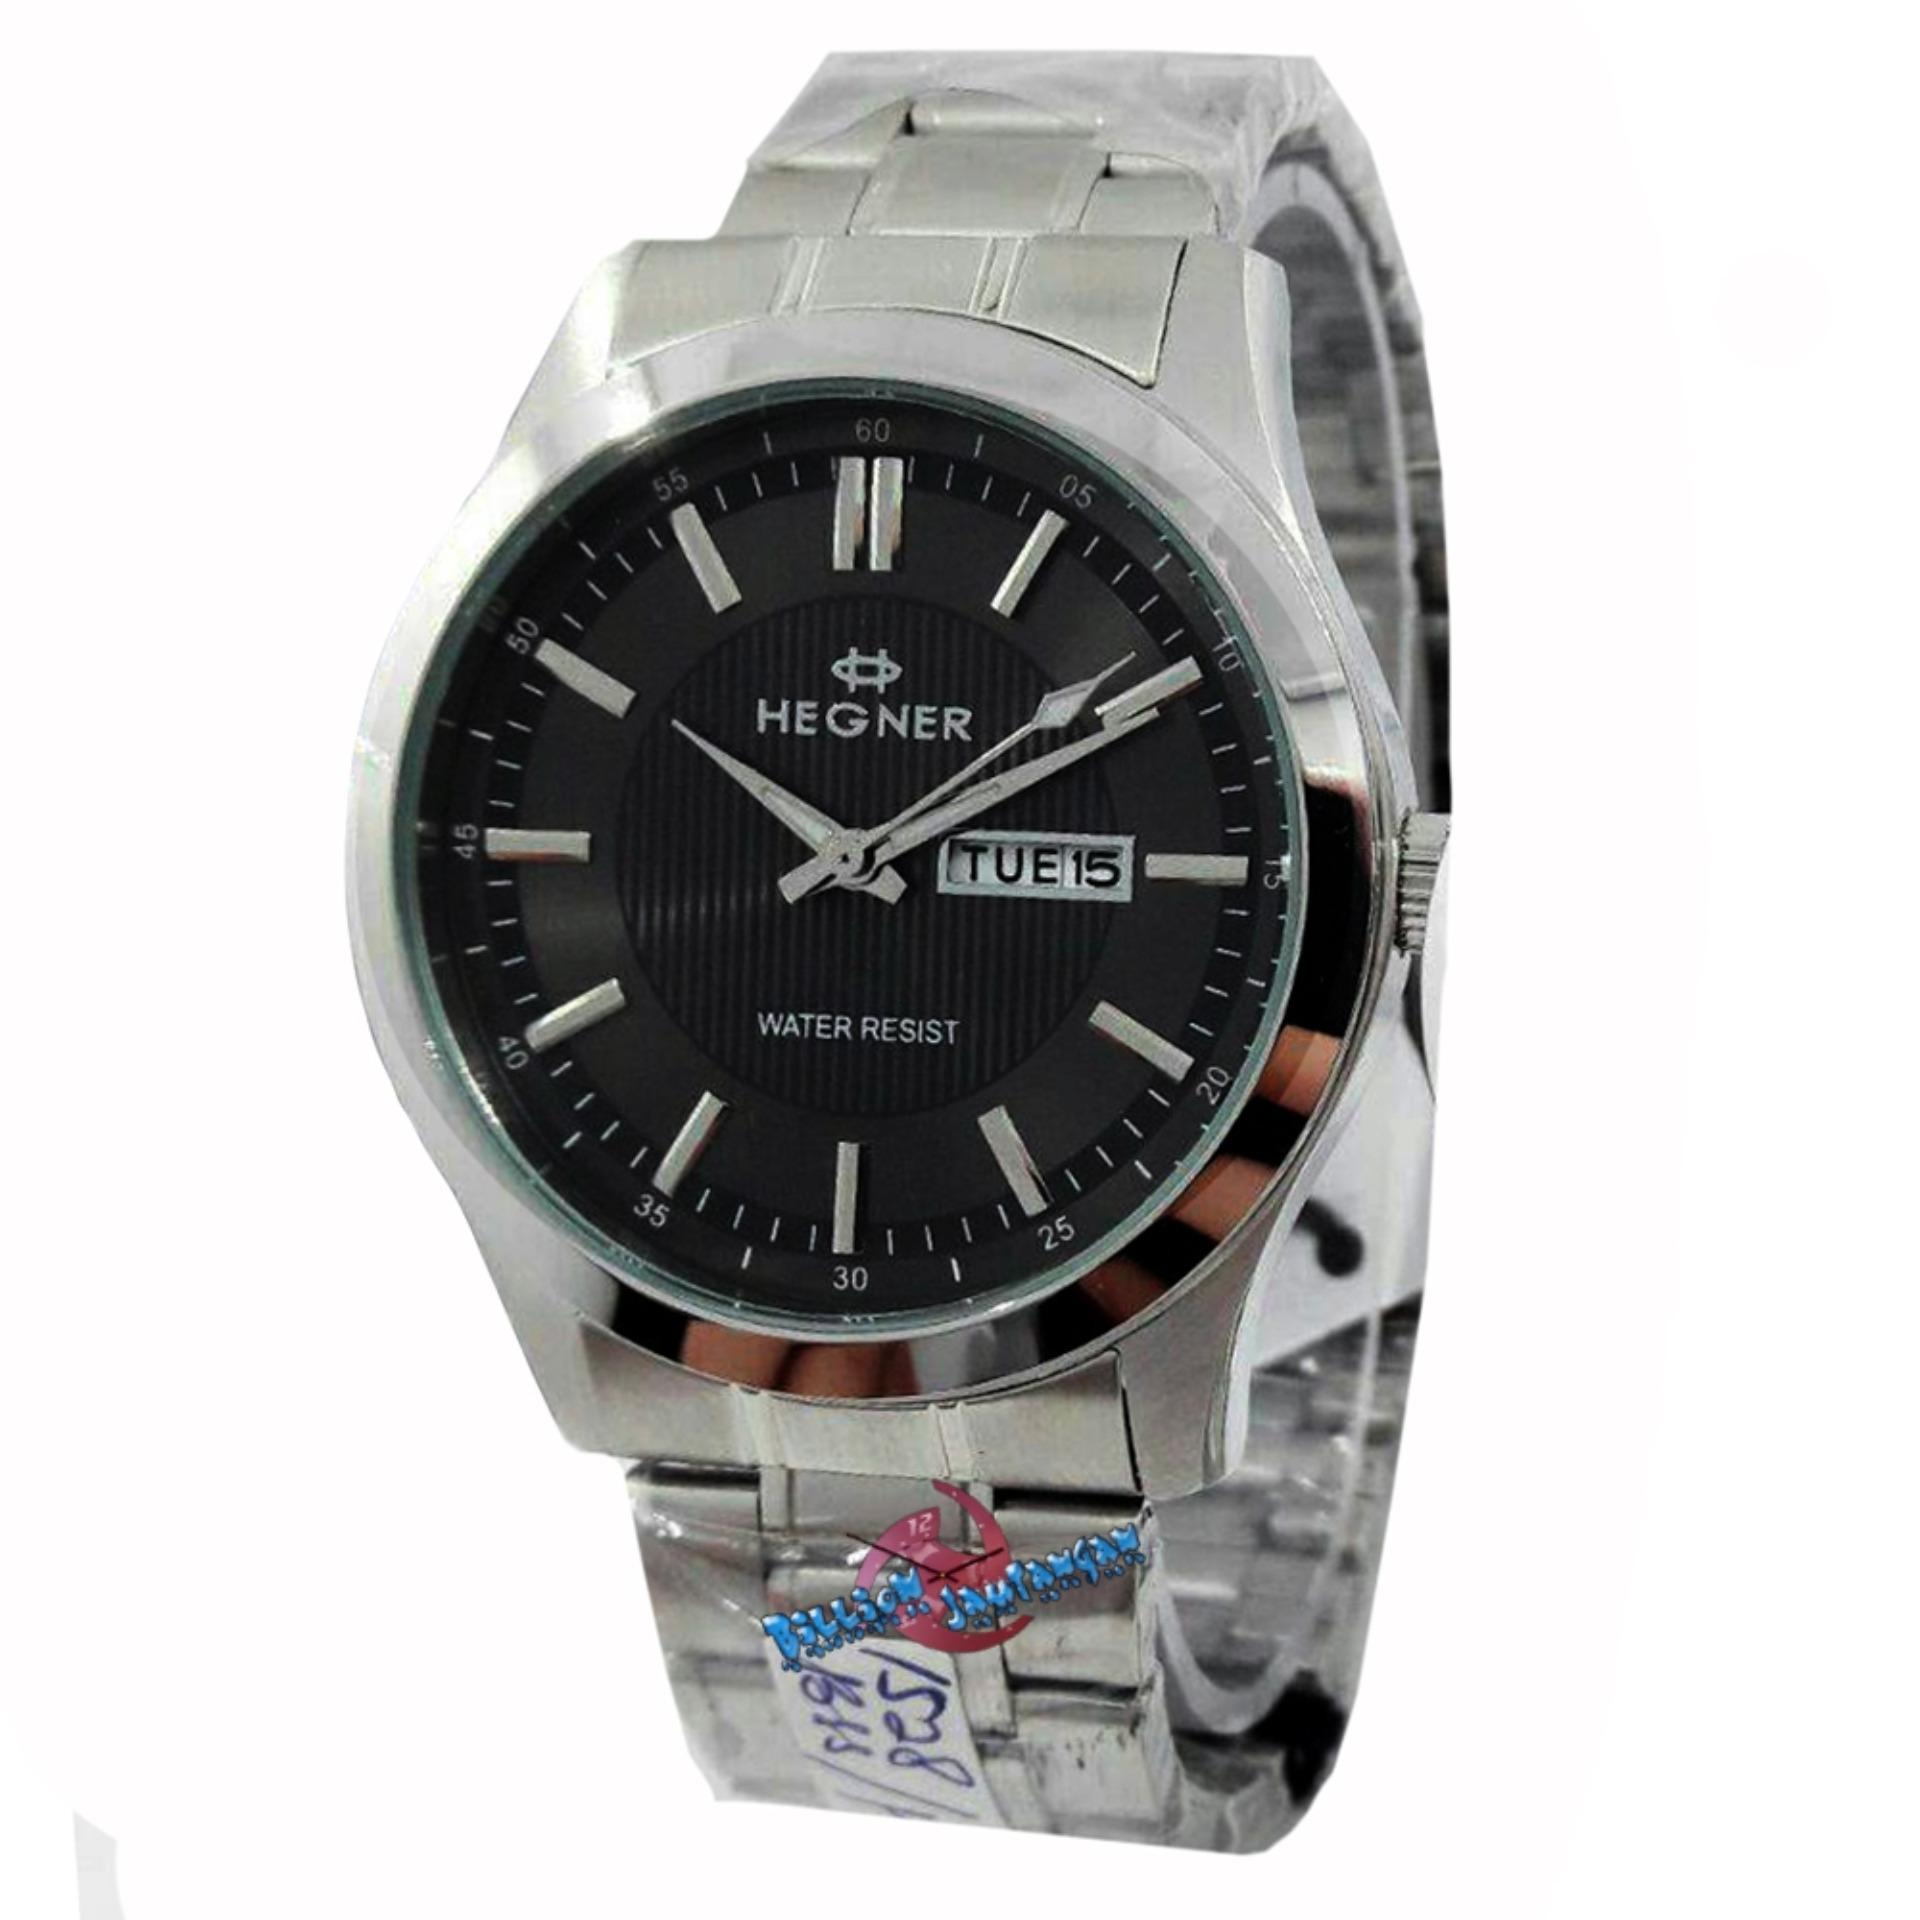 ... Hegner - H1528M - Jam Tangan Pria - Strap Stainless Steel - SilverHitam ...